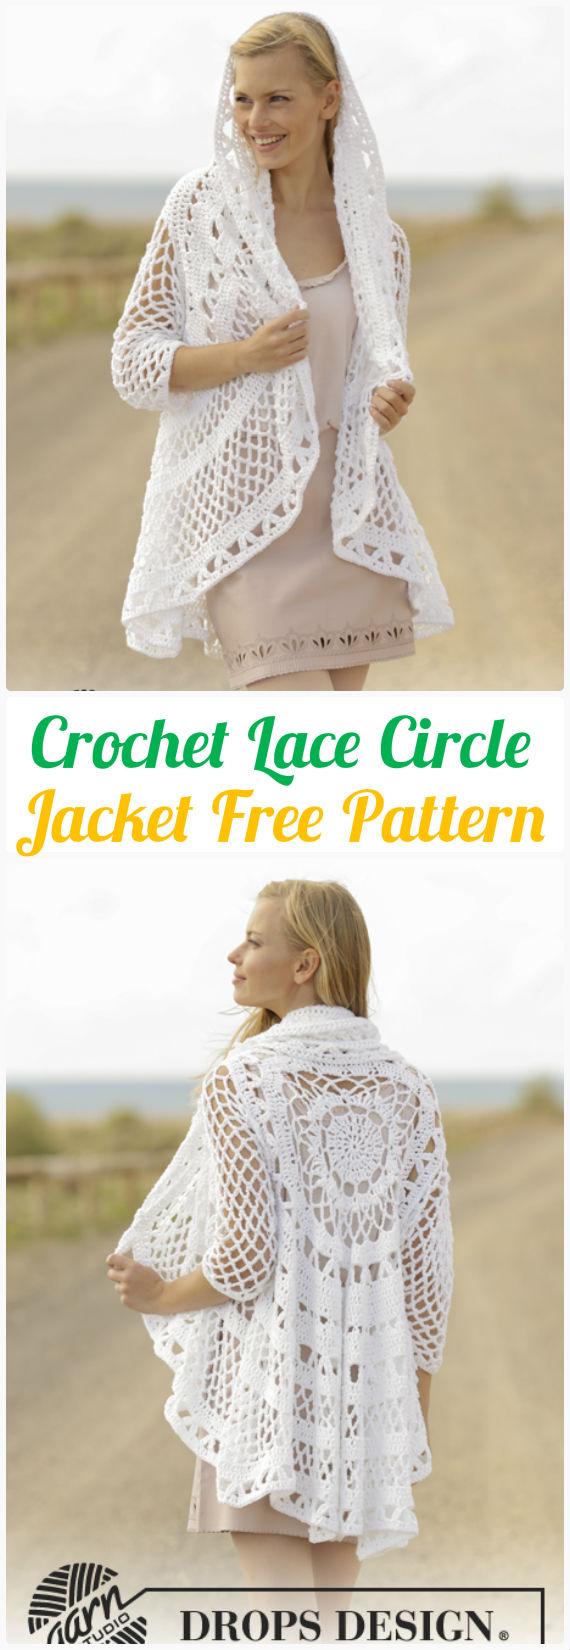 DIY Crochet Lace Circle Jacket Free Pattern-Crochet Circular Vest Sweater Jacket Patterns